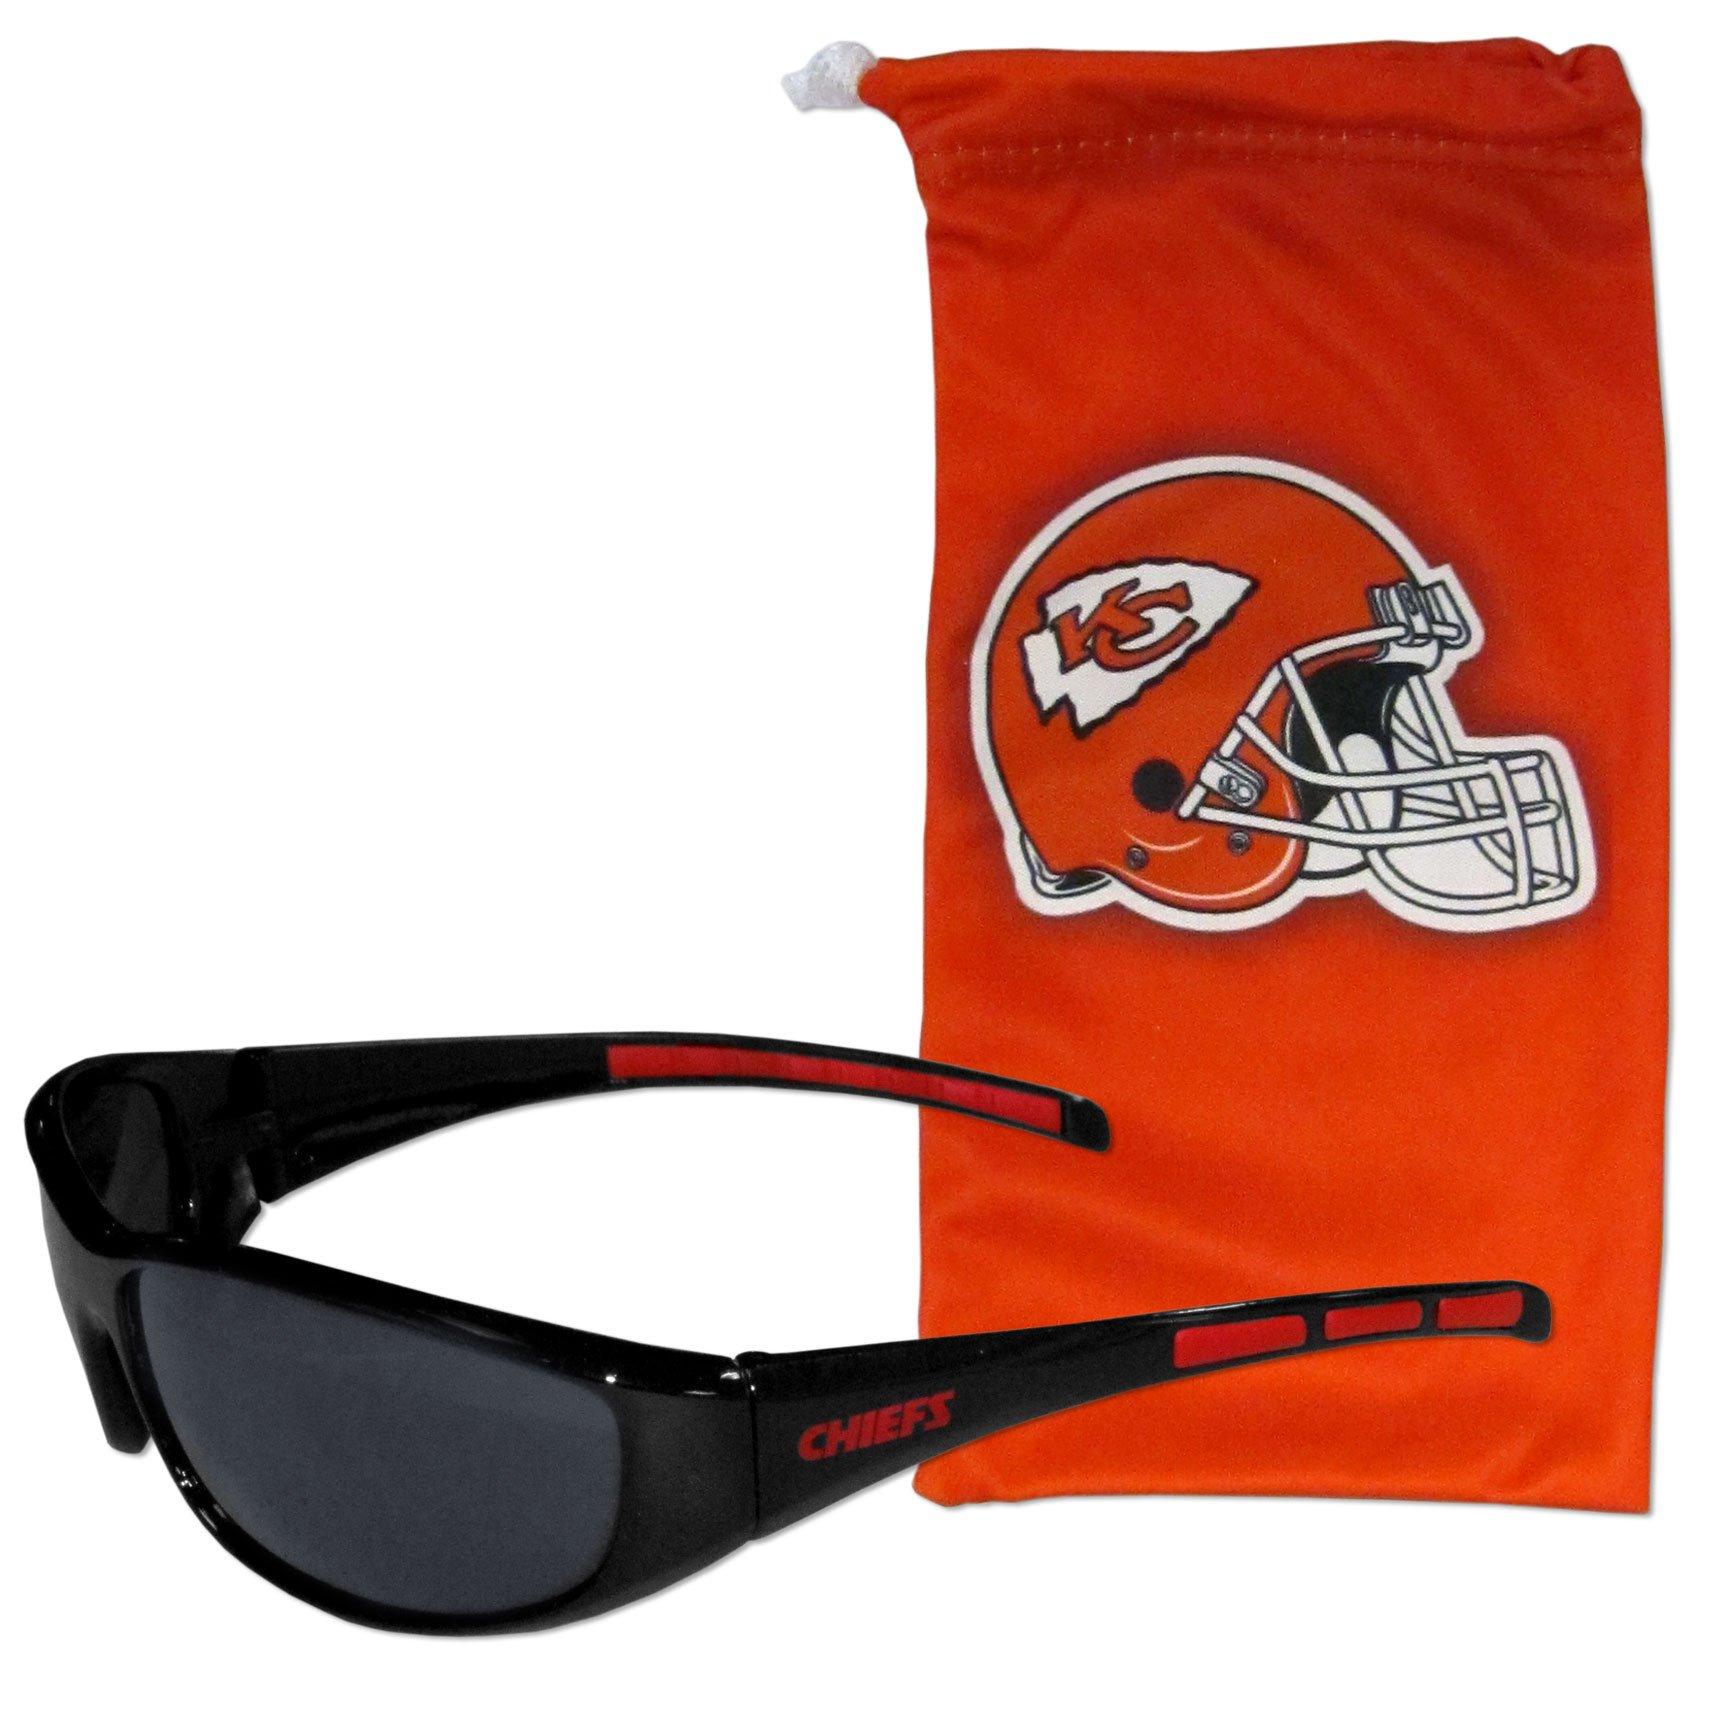 NFL Kansas City Chiefs Adult Sunglass and Bag Set, Red